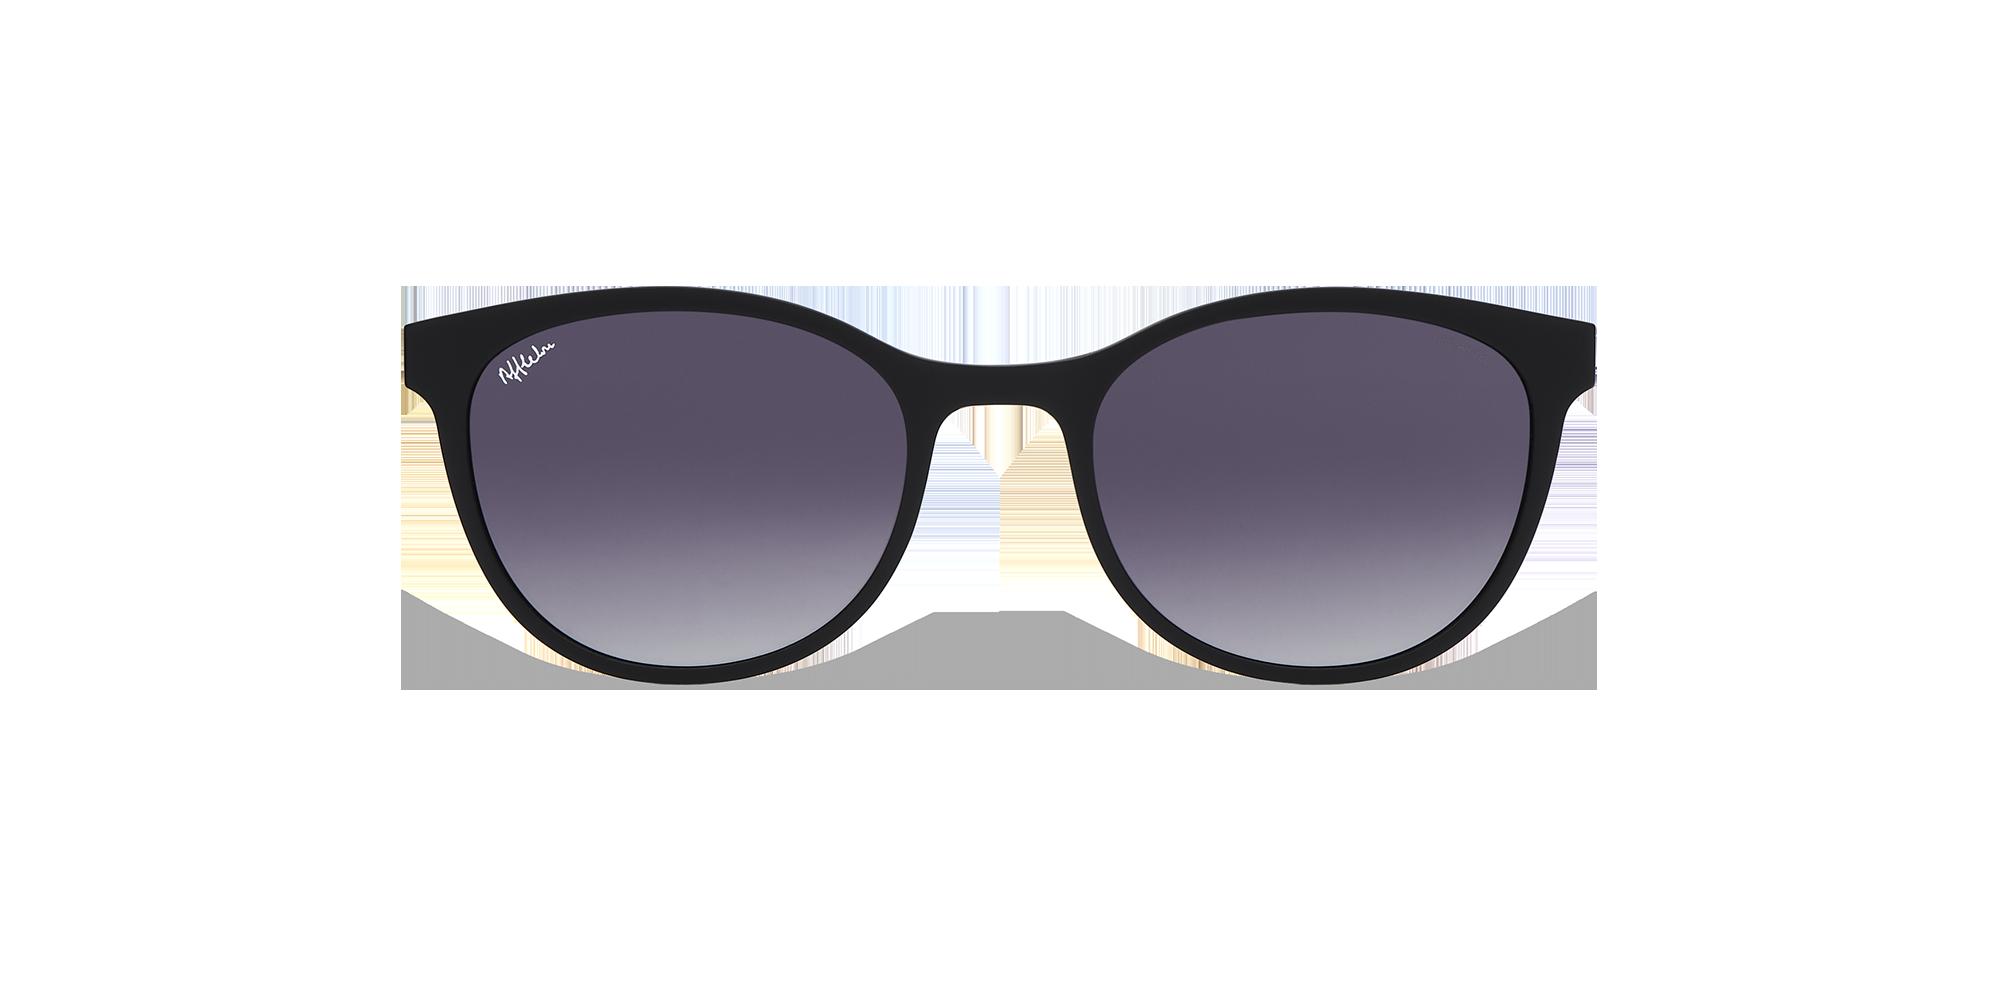 afflelou/france/products/smart_clip/clips_glasses/TMK45POBK014818.png